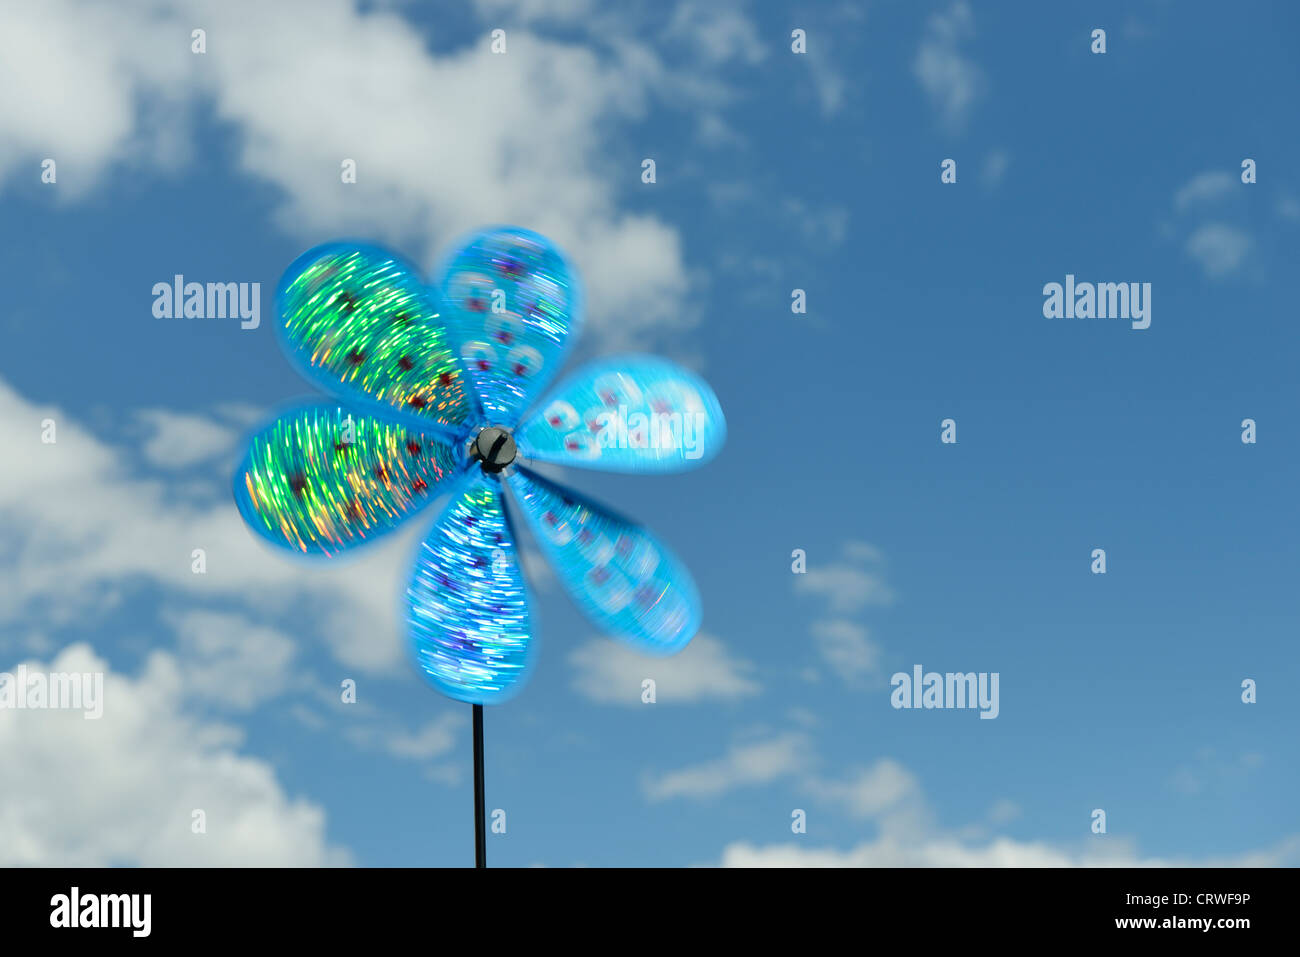 Spielzeug-Windmühle vor blauem Himmel Stockbild